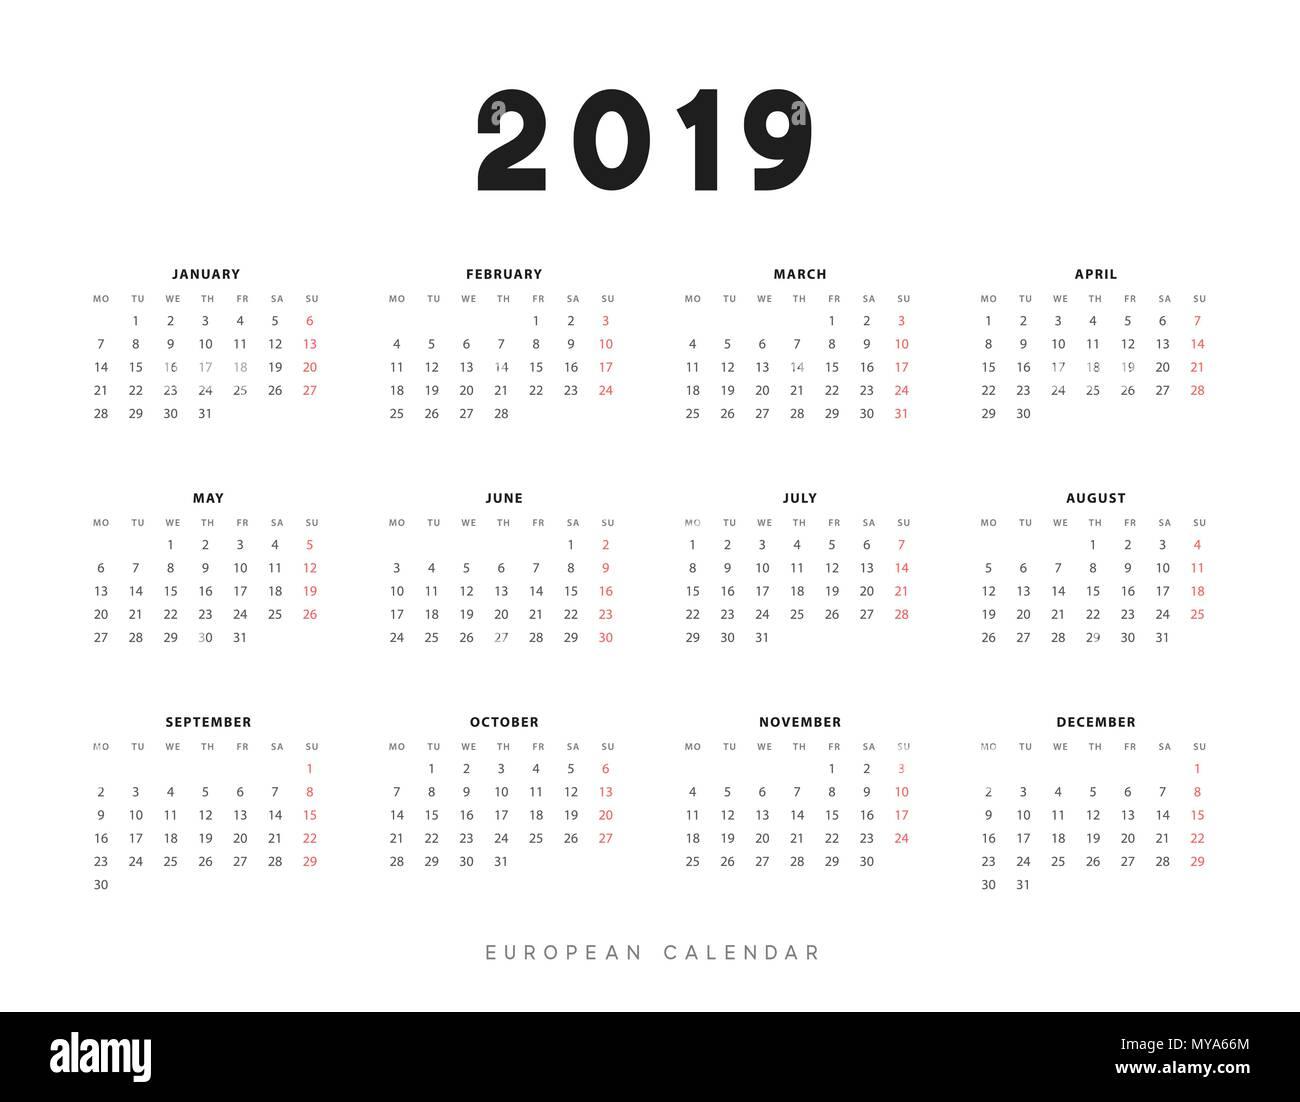 Calendar 2019 -2021 Simple European calendar for 2019 years, week starts on Monday